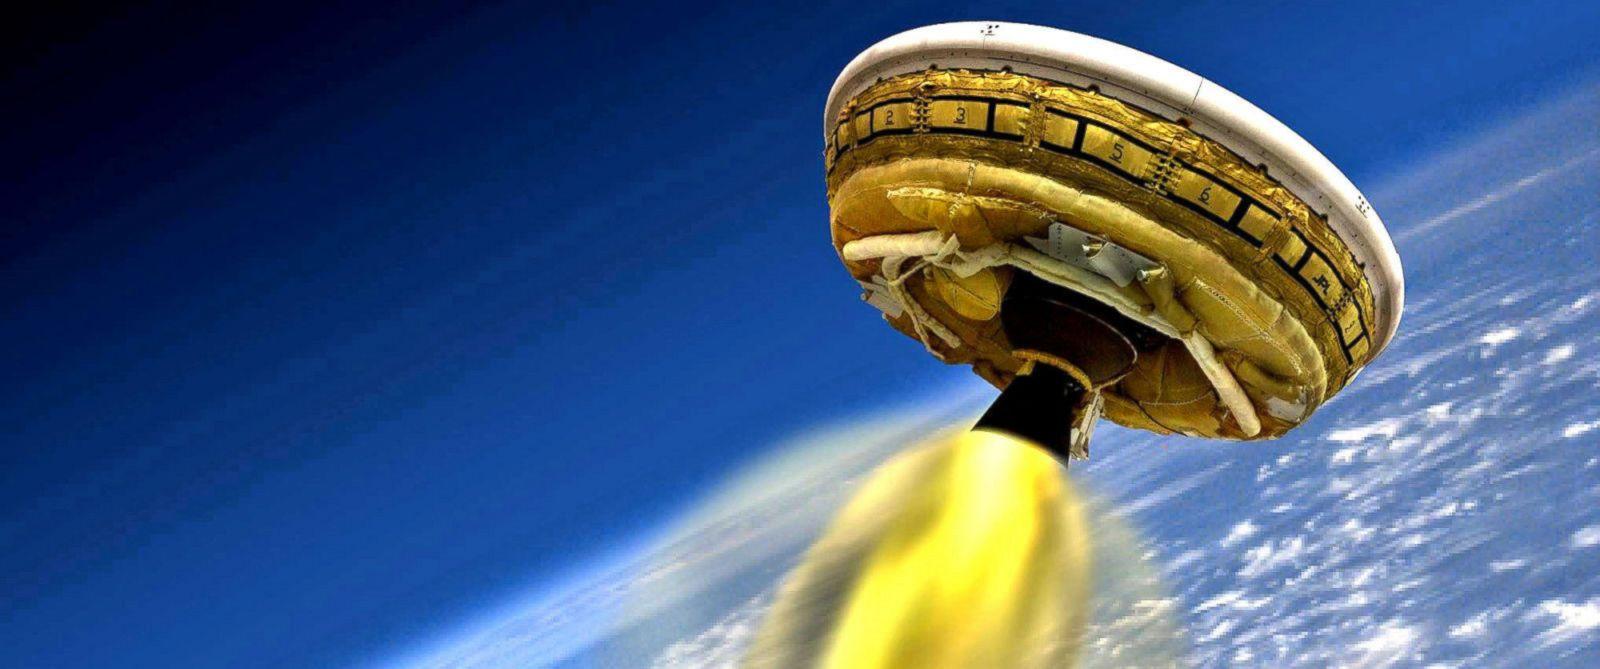 mars landing today live - photo #20